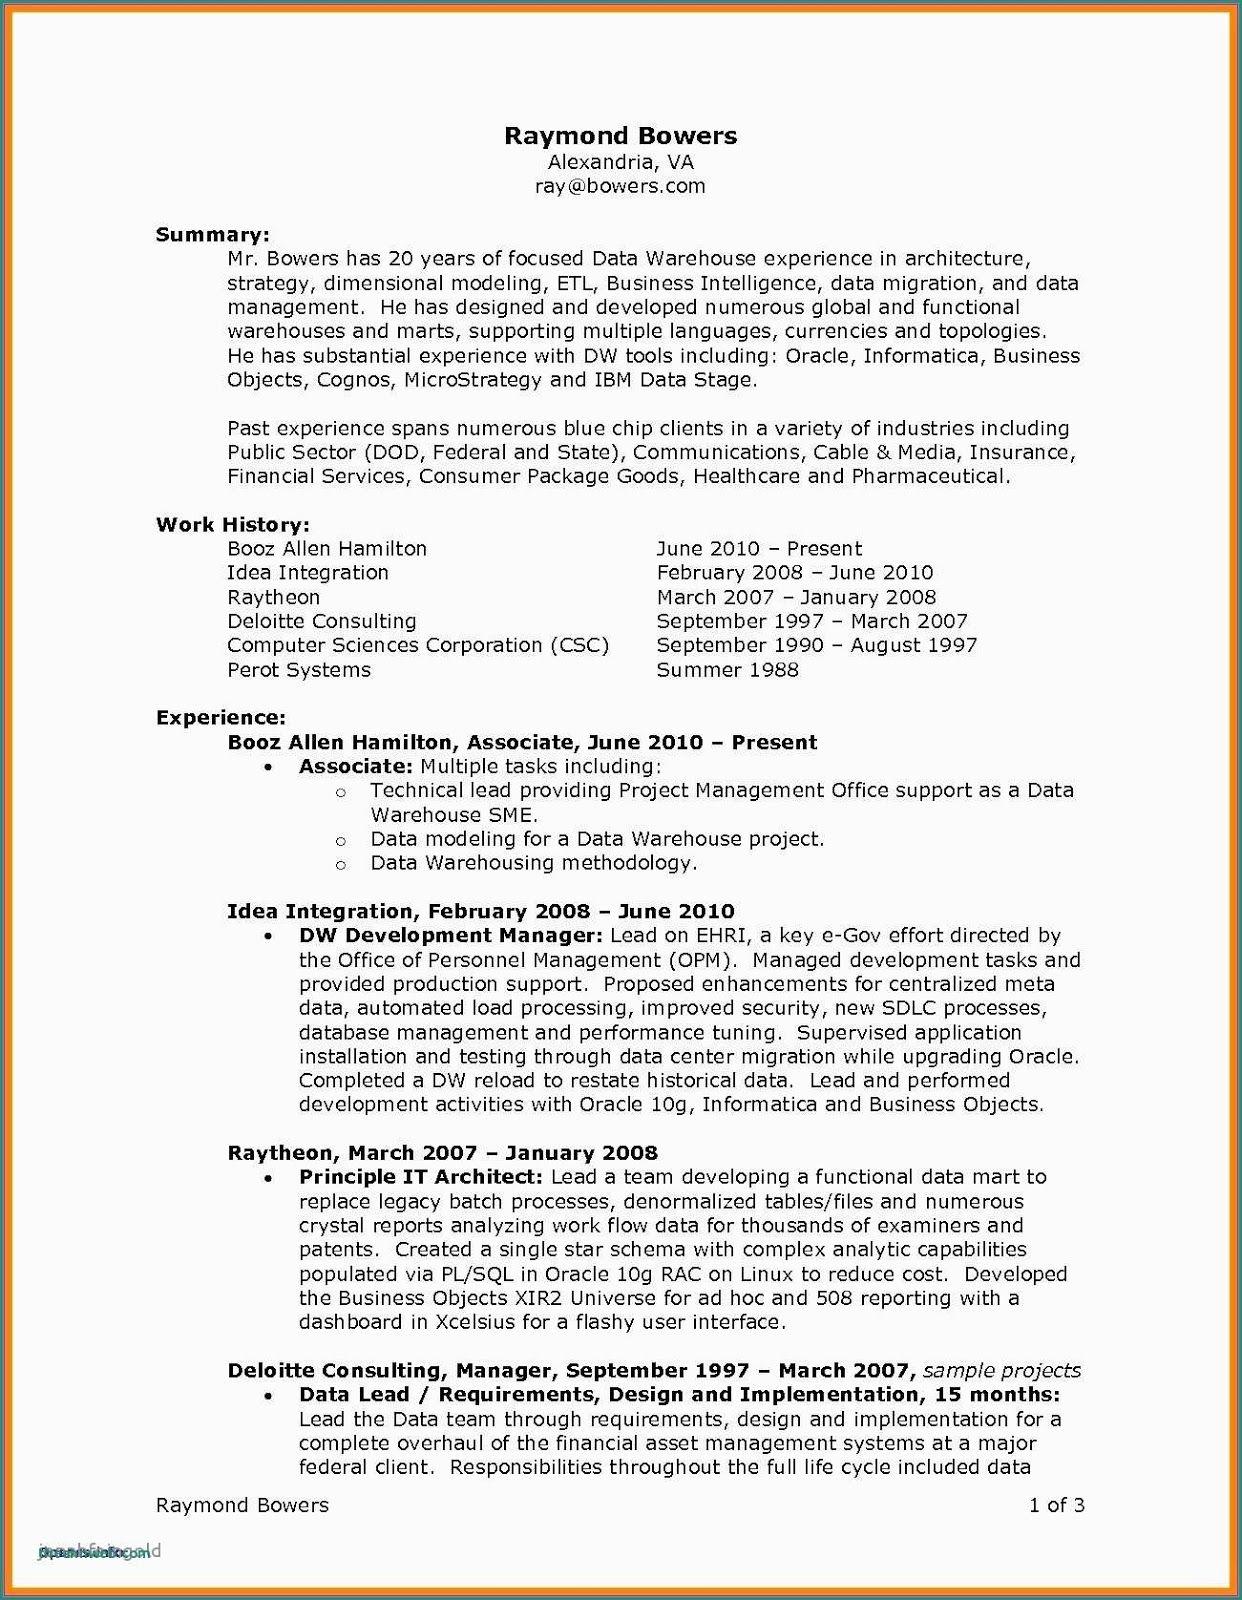 Academic resume sample 2019 Academic Cv Samples 2020 Beste